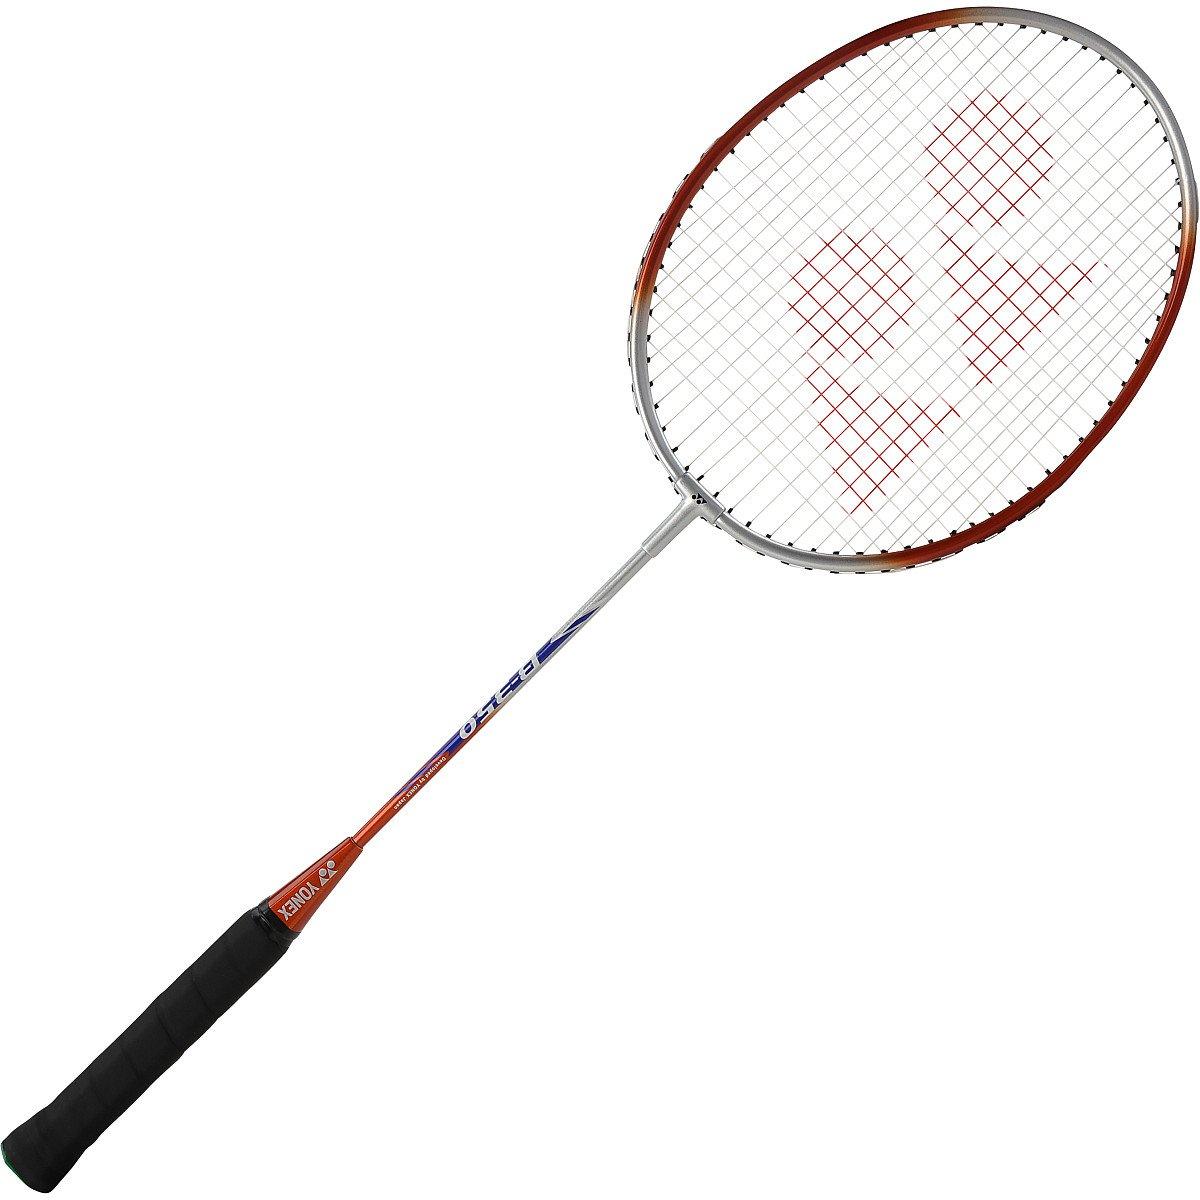 YONEX B-350 Badminton Racquet/Racket - Be Ready to Play